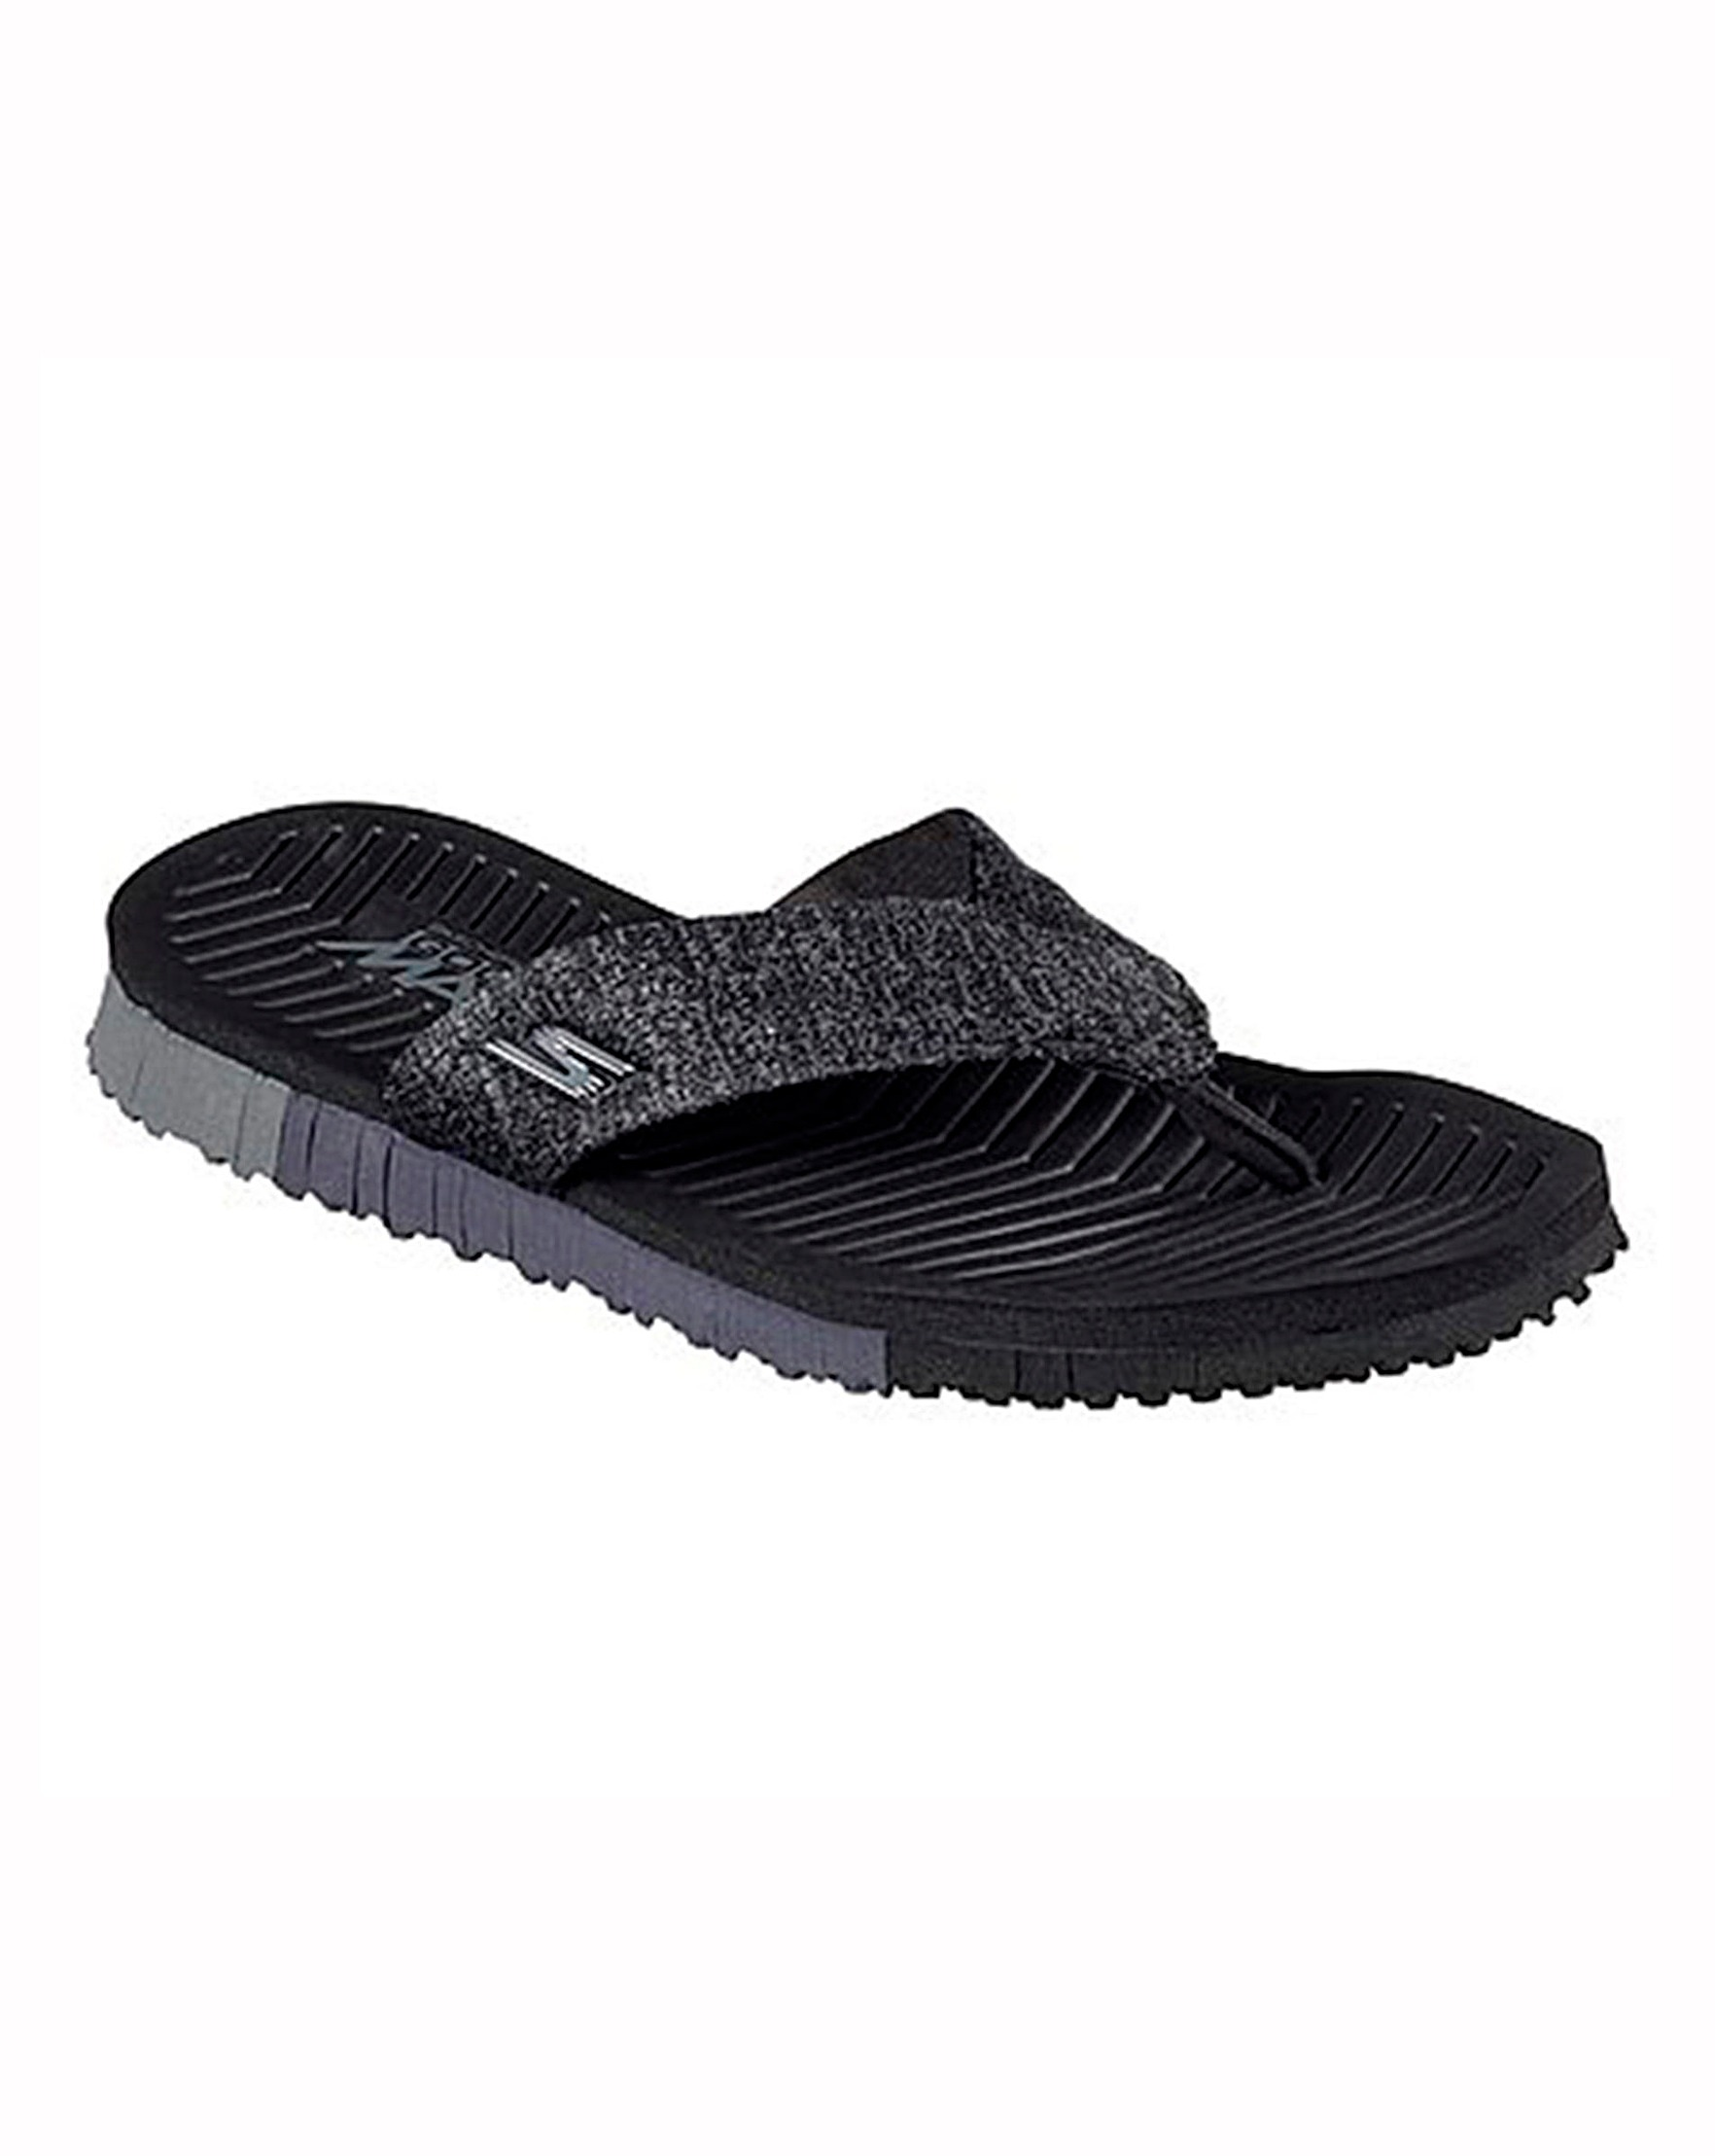 70f51435bbd6 Skechers Go Flex Solana Sandals